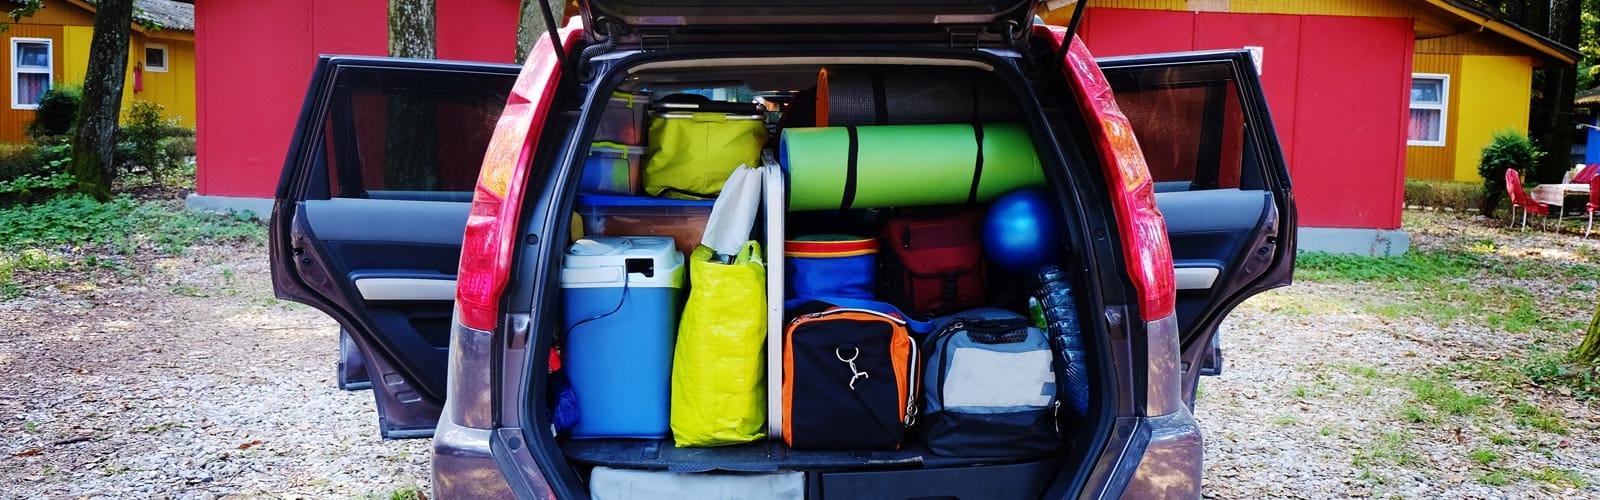 Camping Trip Preperation